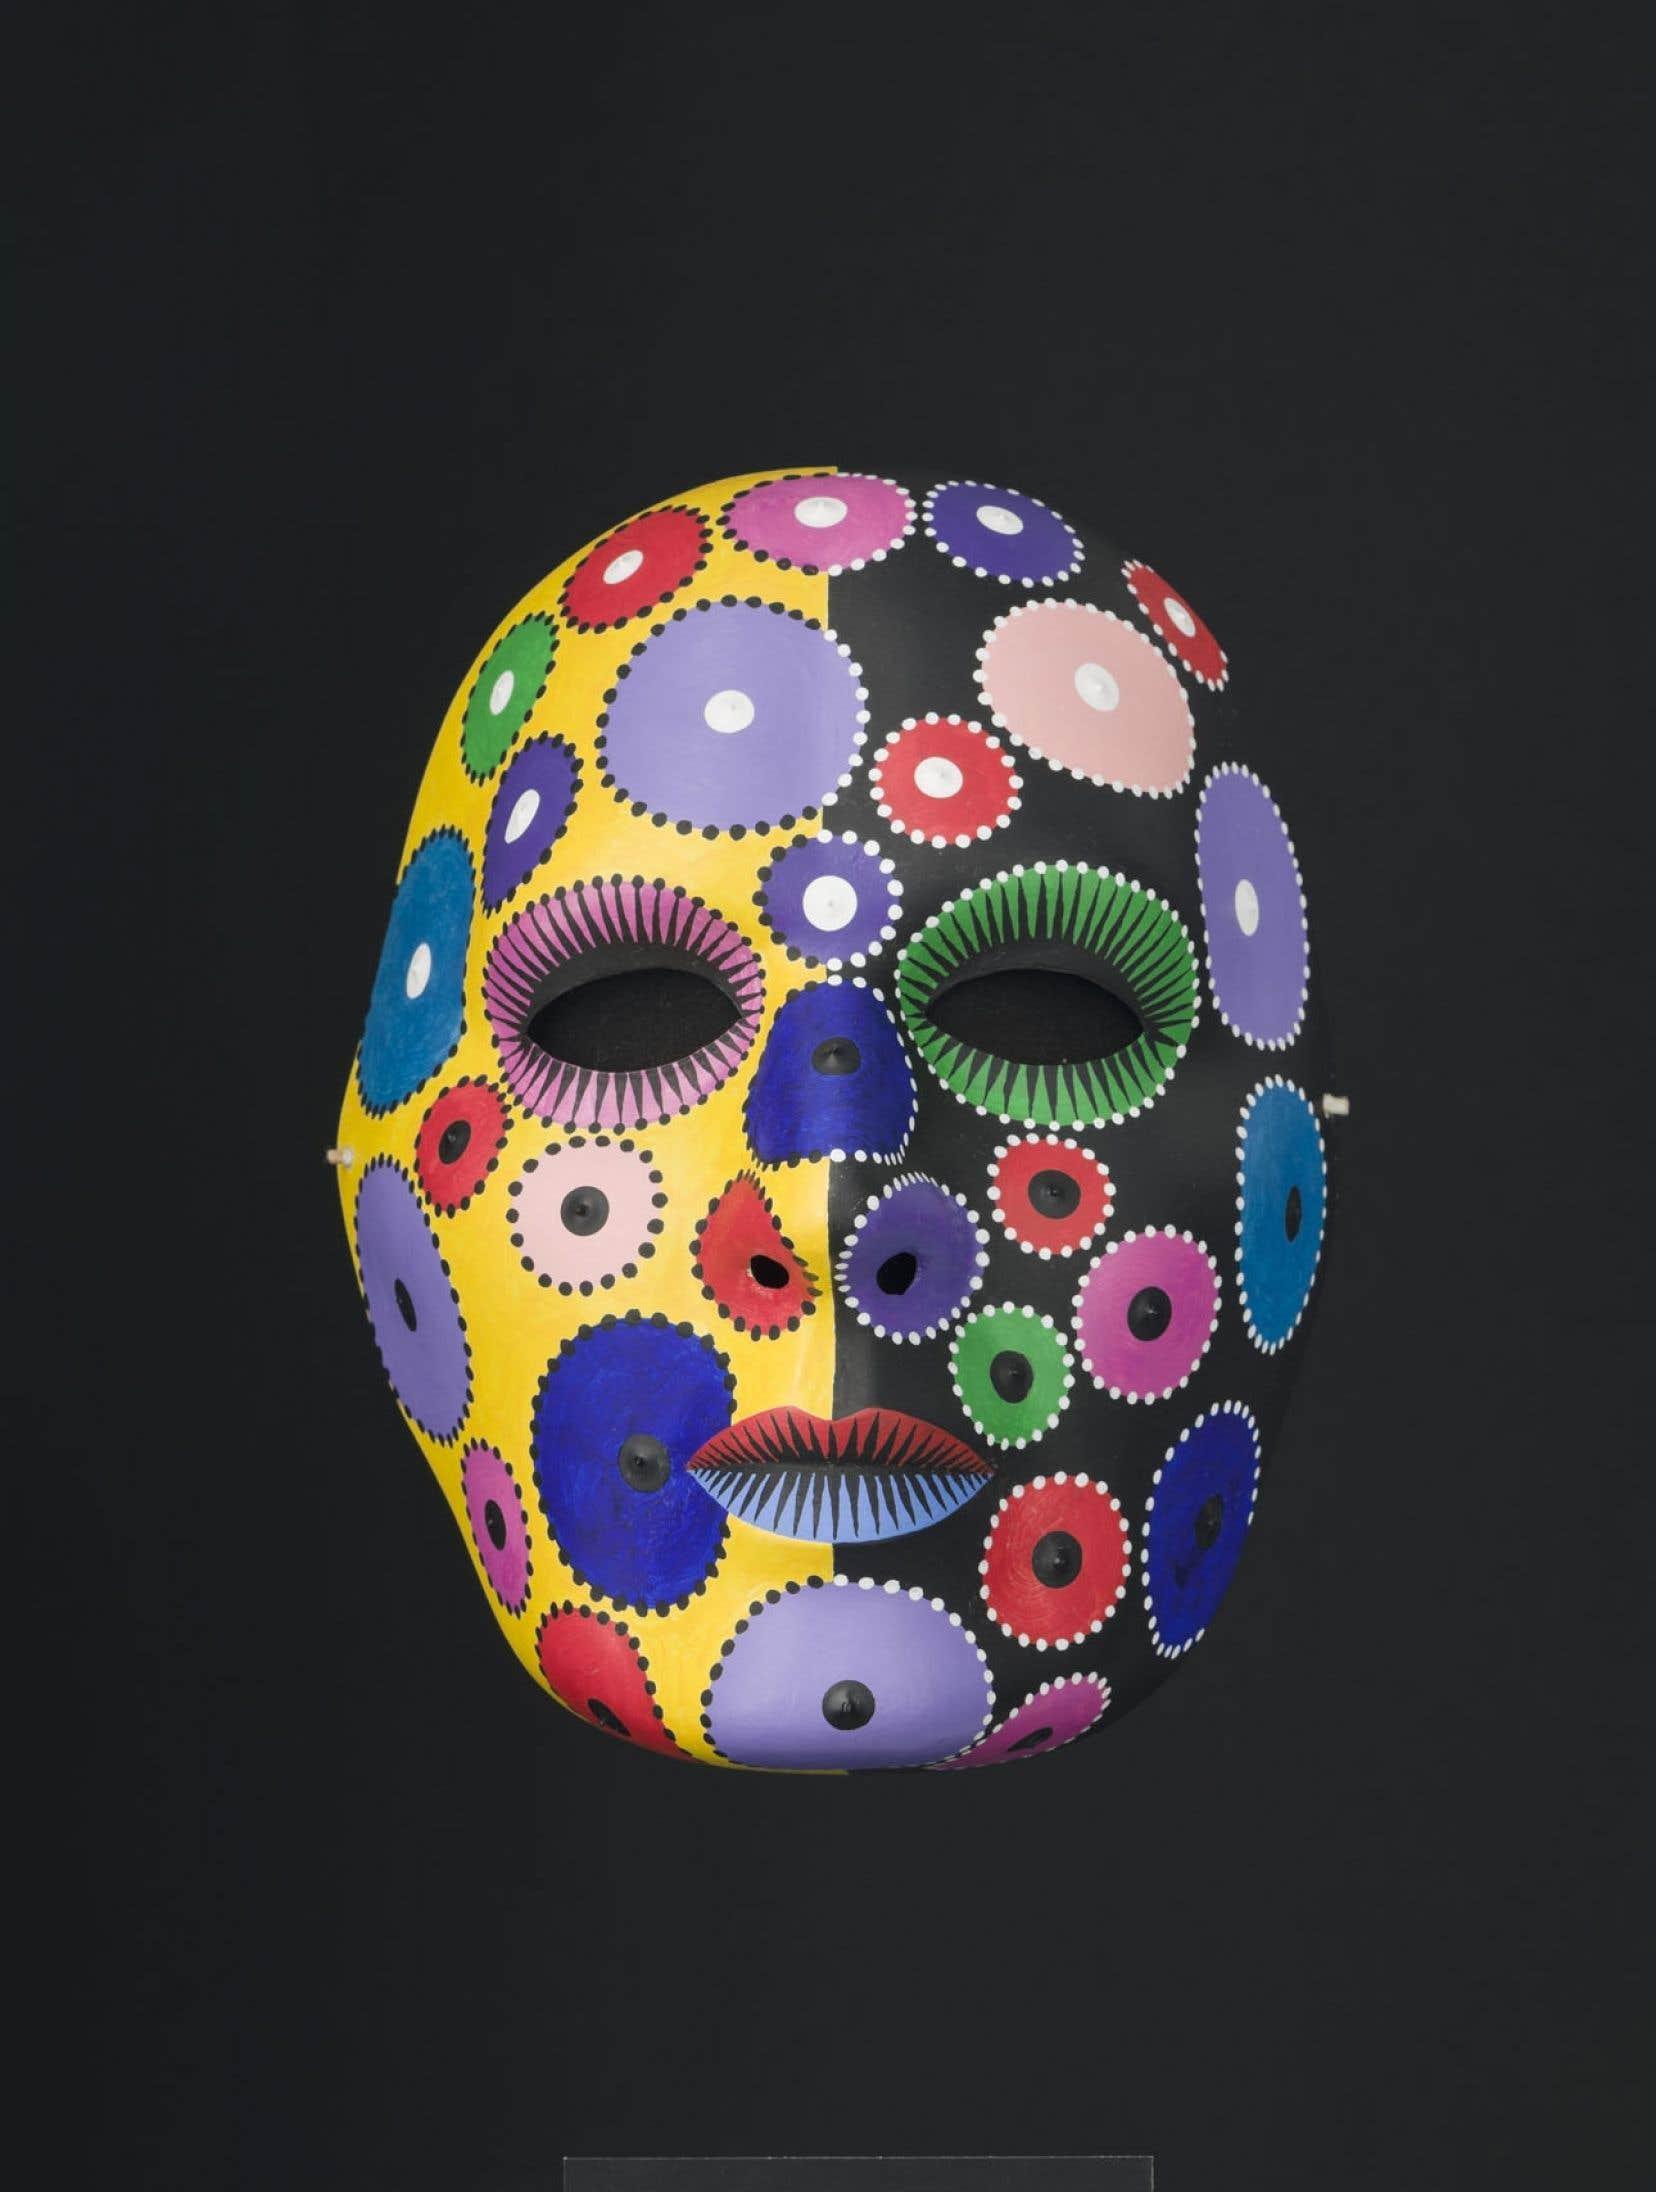 Alfred Pellan, Masque 44, 1971, acrylique sur masque de plastique 21,7 x 17 x 11 cm. Collection MNBAQ. Legs Madeleine Poliseno-Pelland.